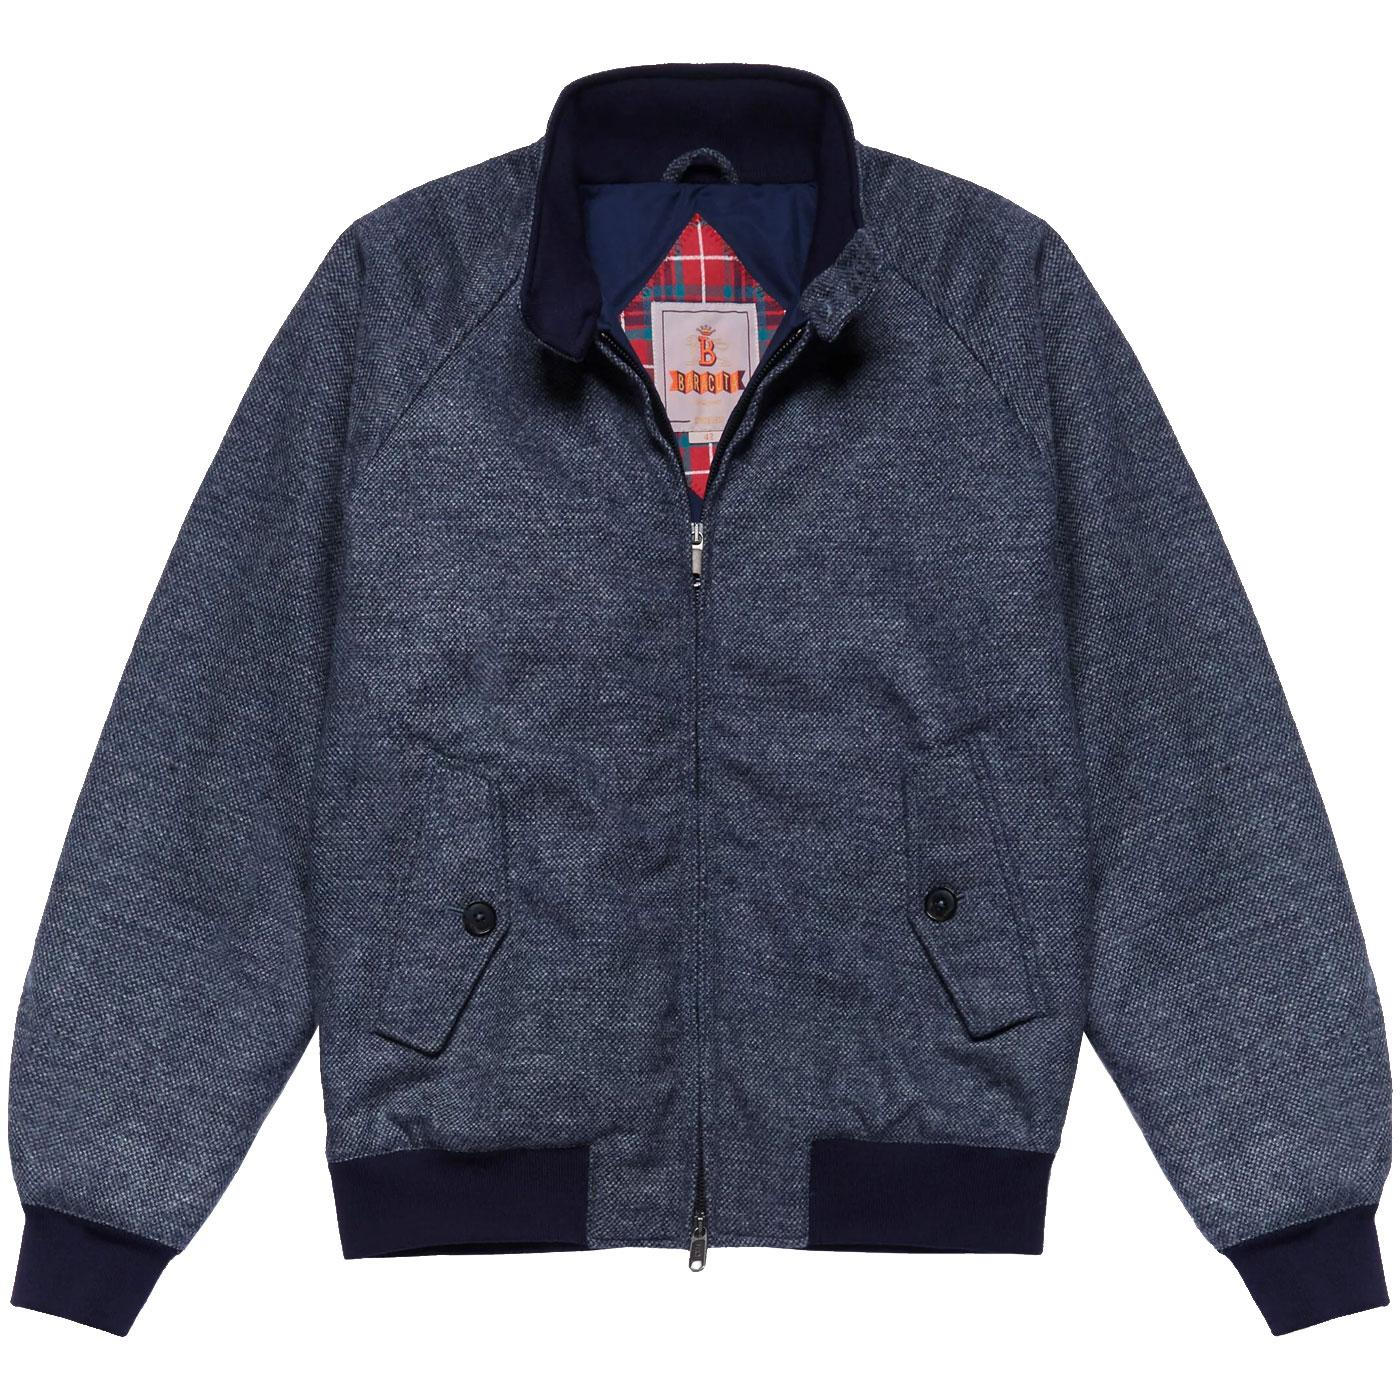 BARACUTA G9 Soft Shetland Harrington Jacket (G/B)